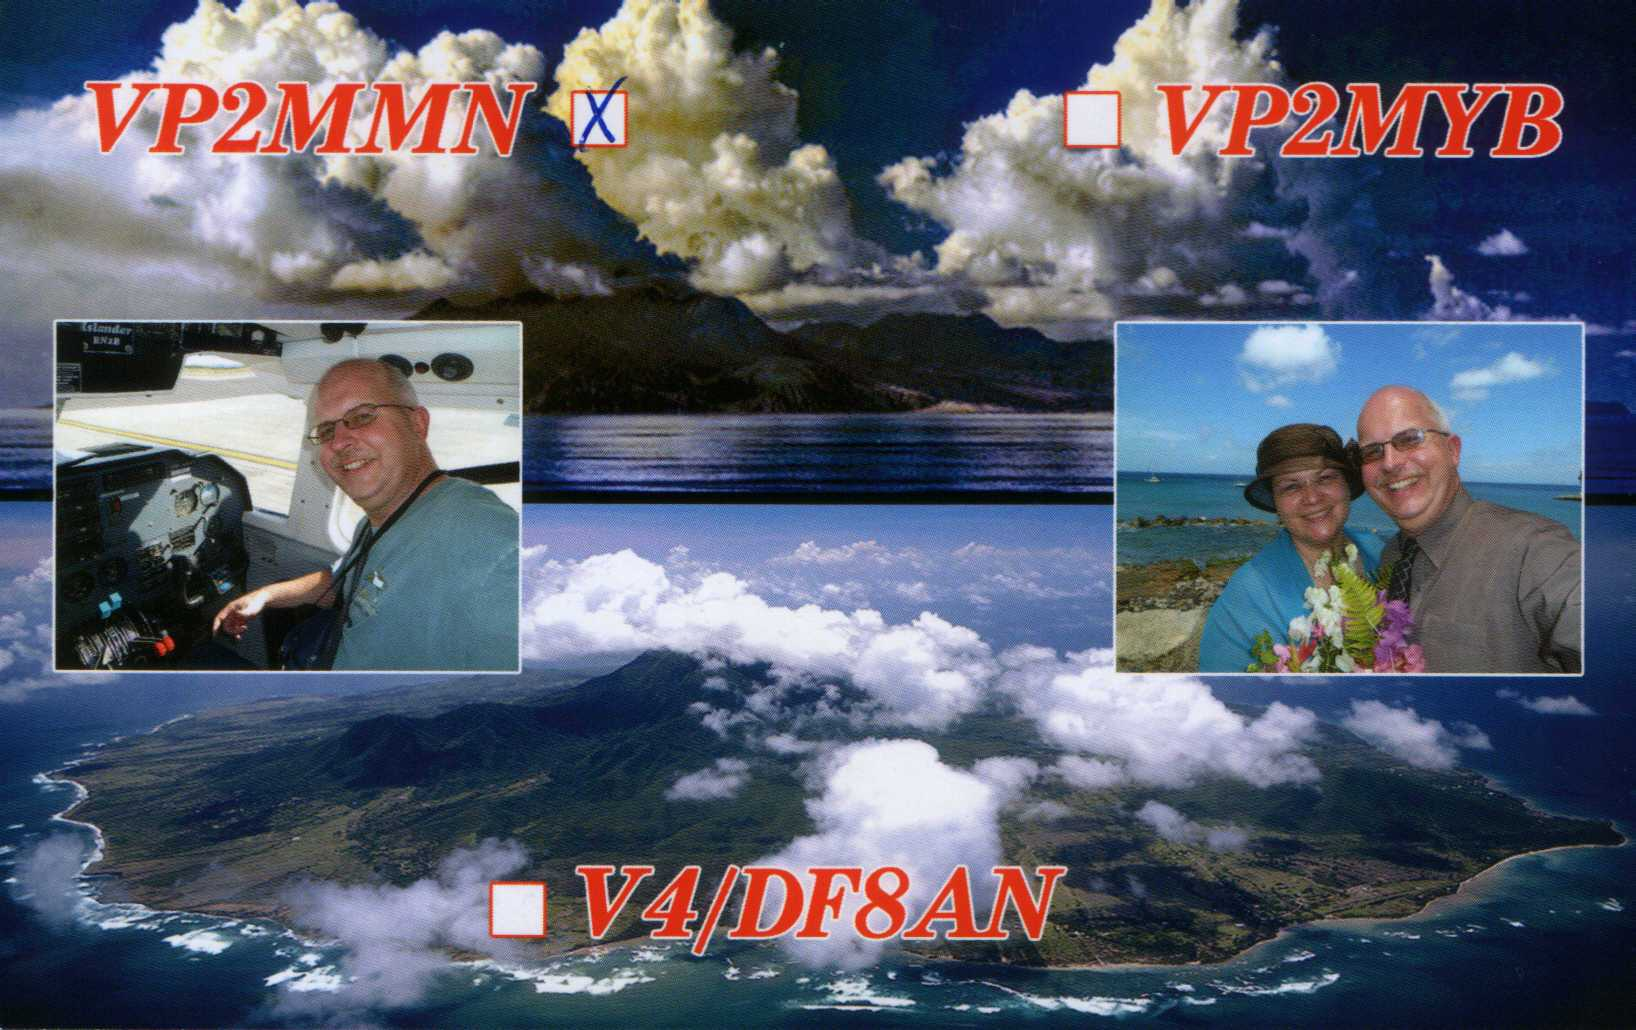 imagizer.imageshack.us/v2/xq90/537/qpR7yl.jpg